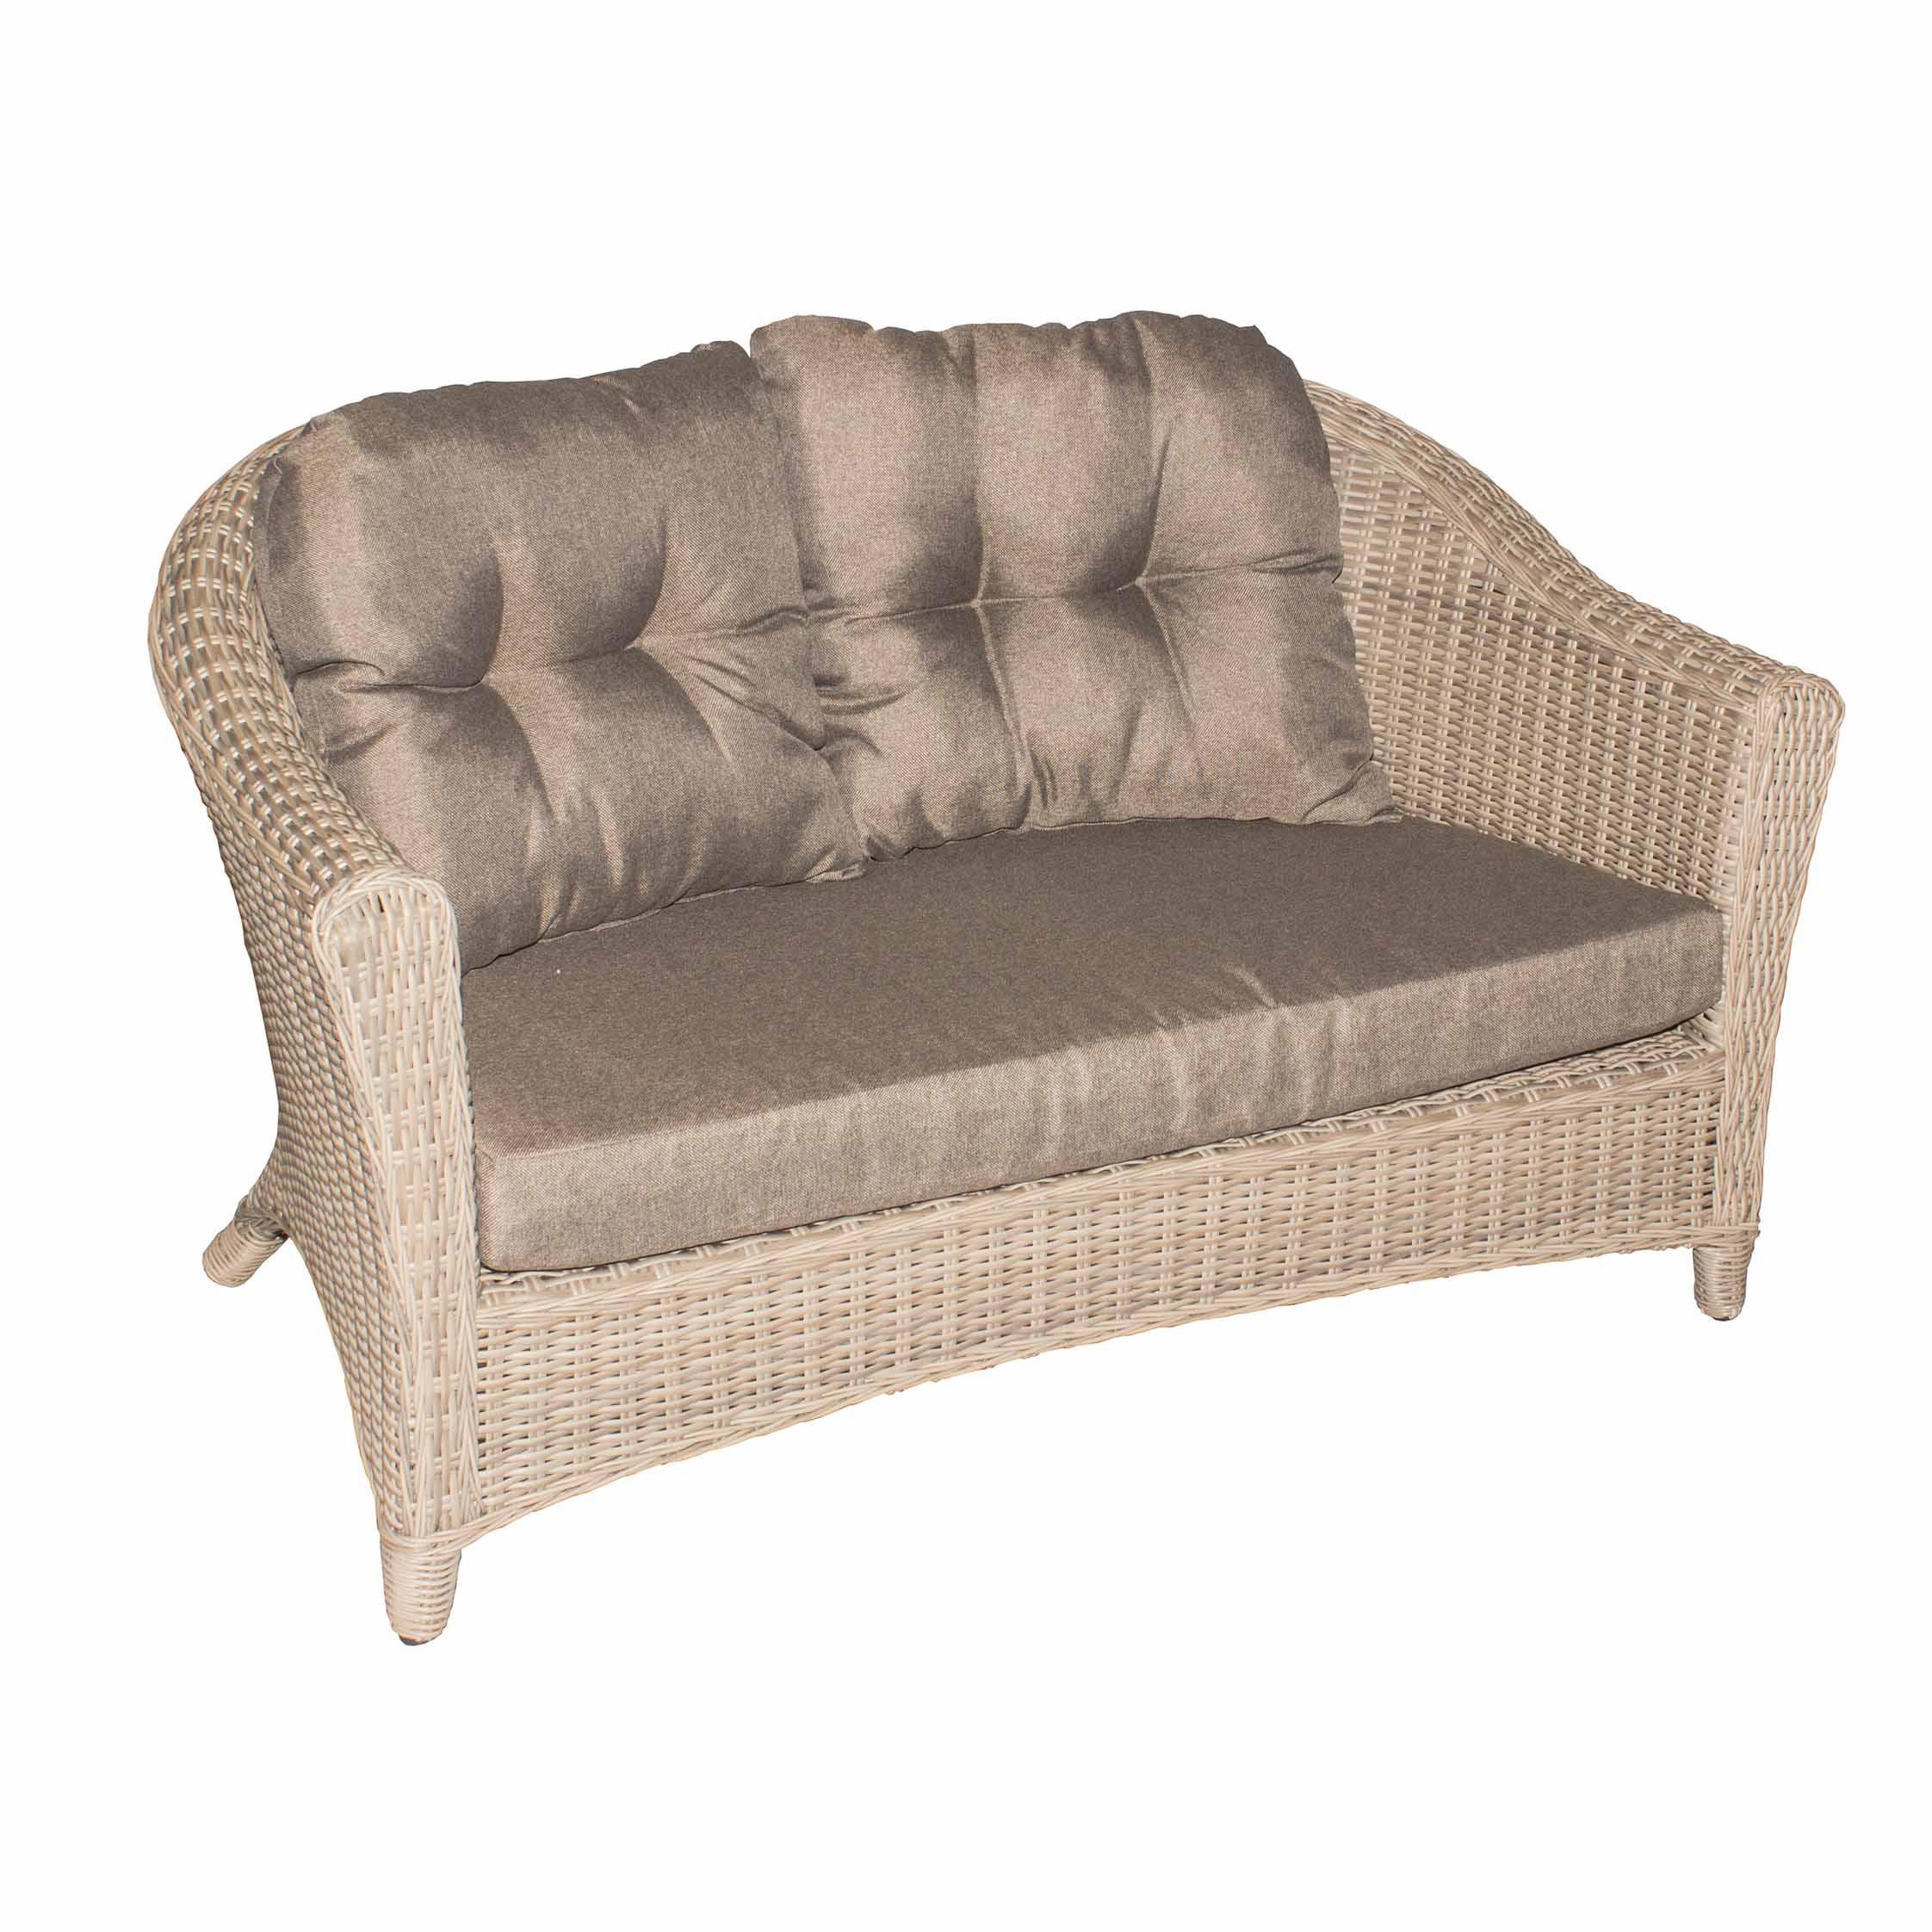 Charleston Lounge 2 Seater Sofa – Patio Warehouse For Charleston Sofas (View 6 of 15)